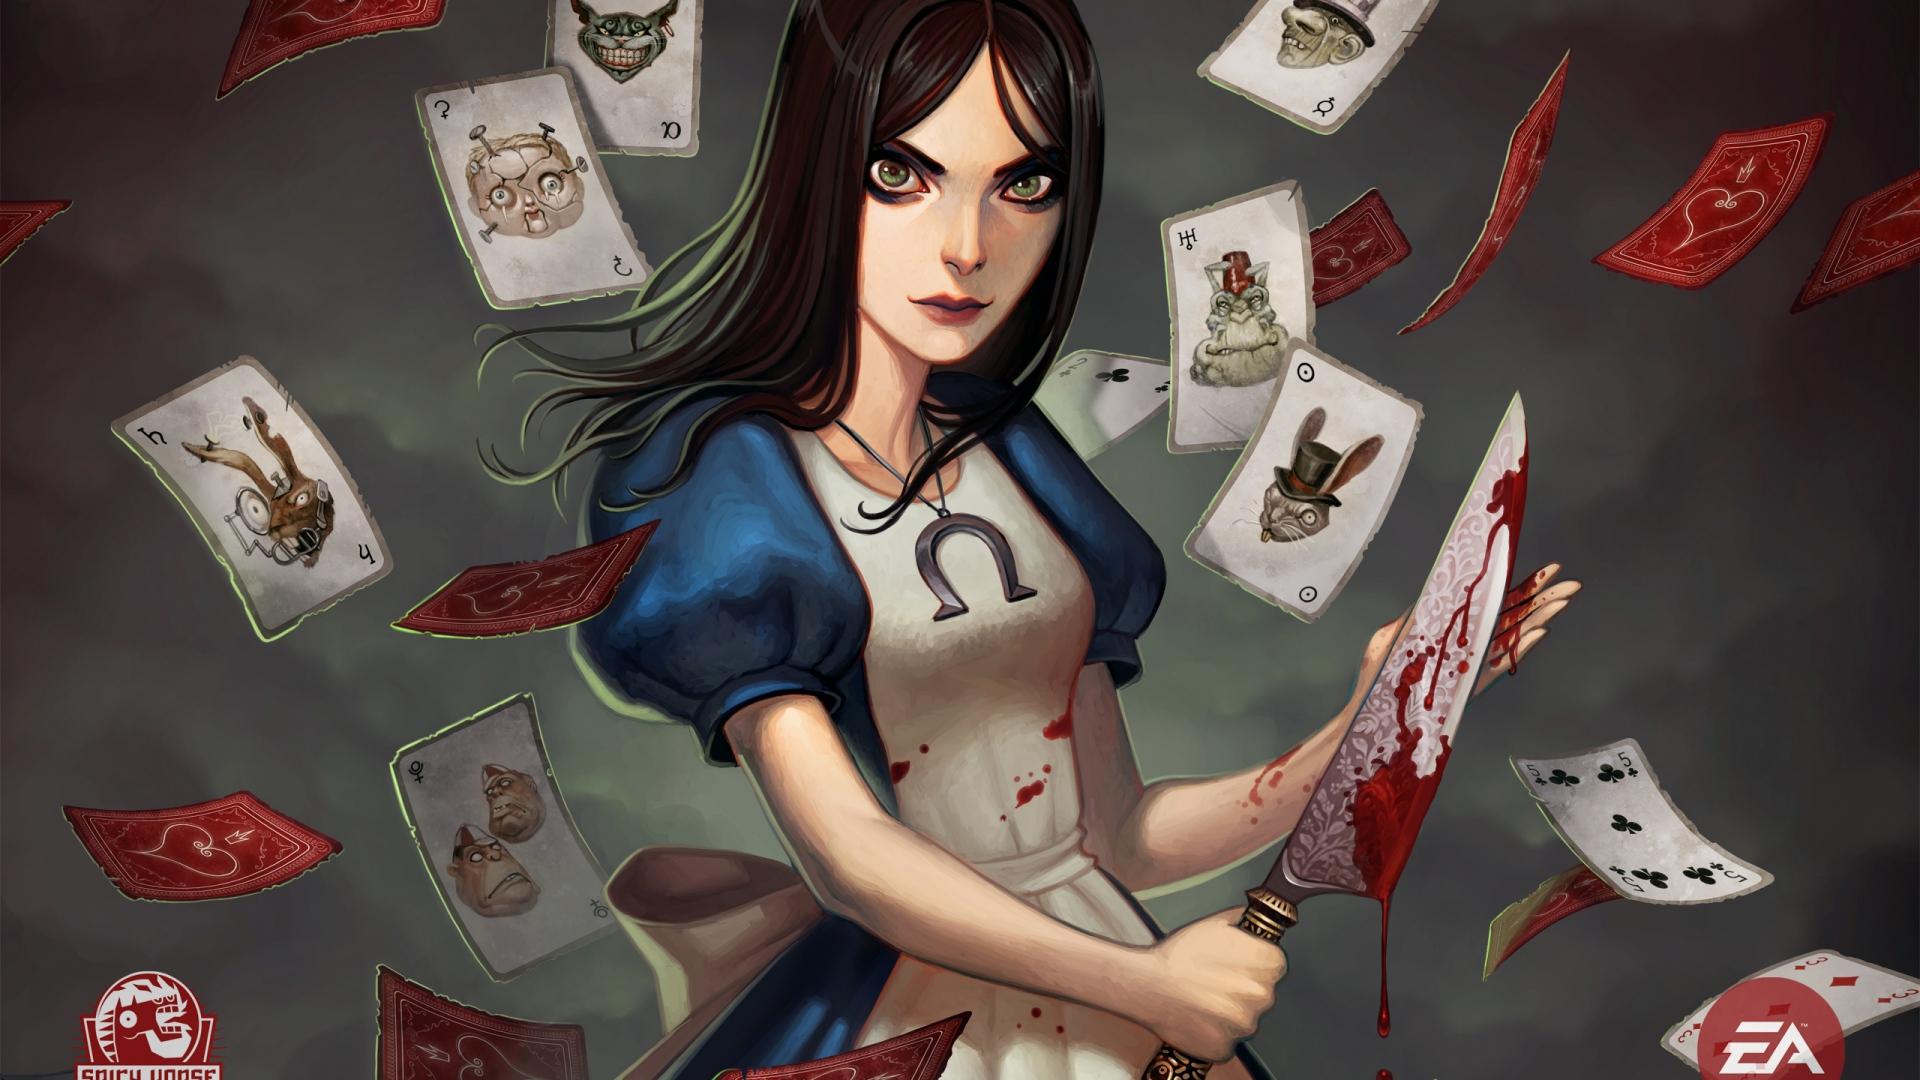 Download Wallpaper 1920x1080 Alice Madness Returns Girl Knife